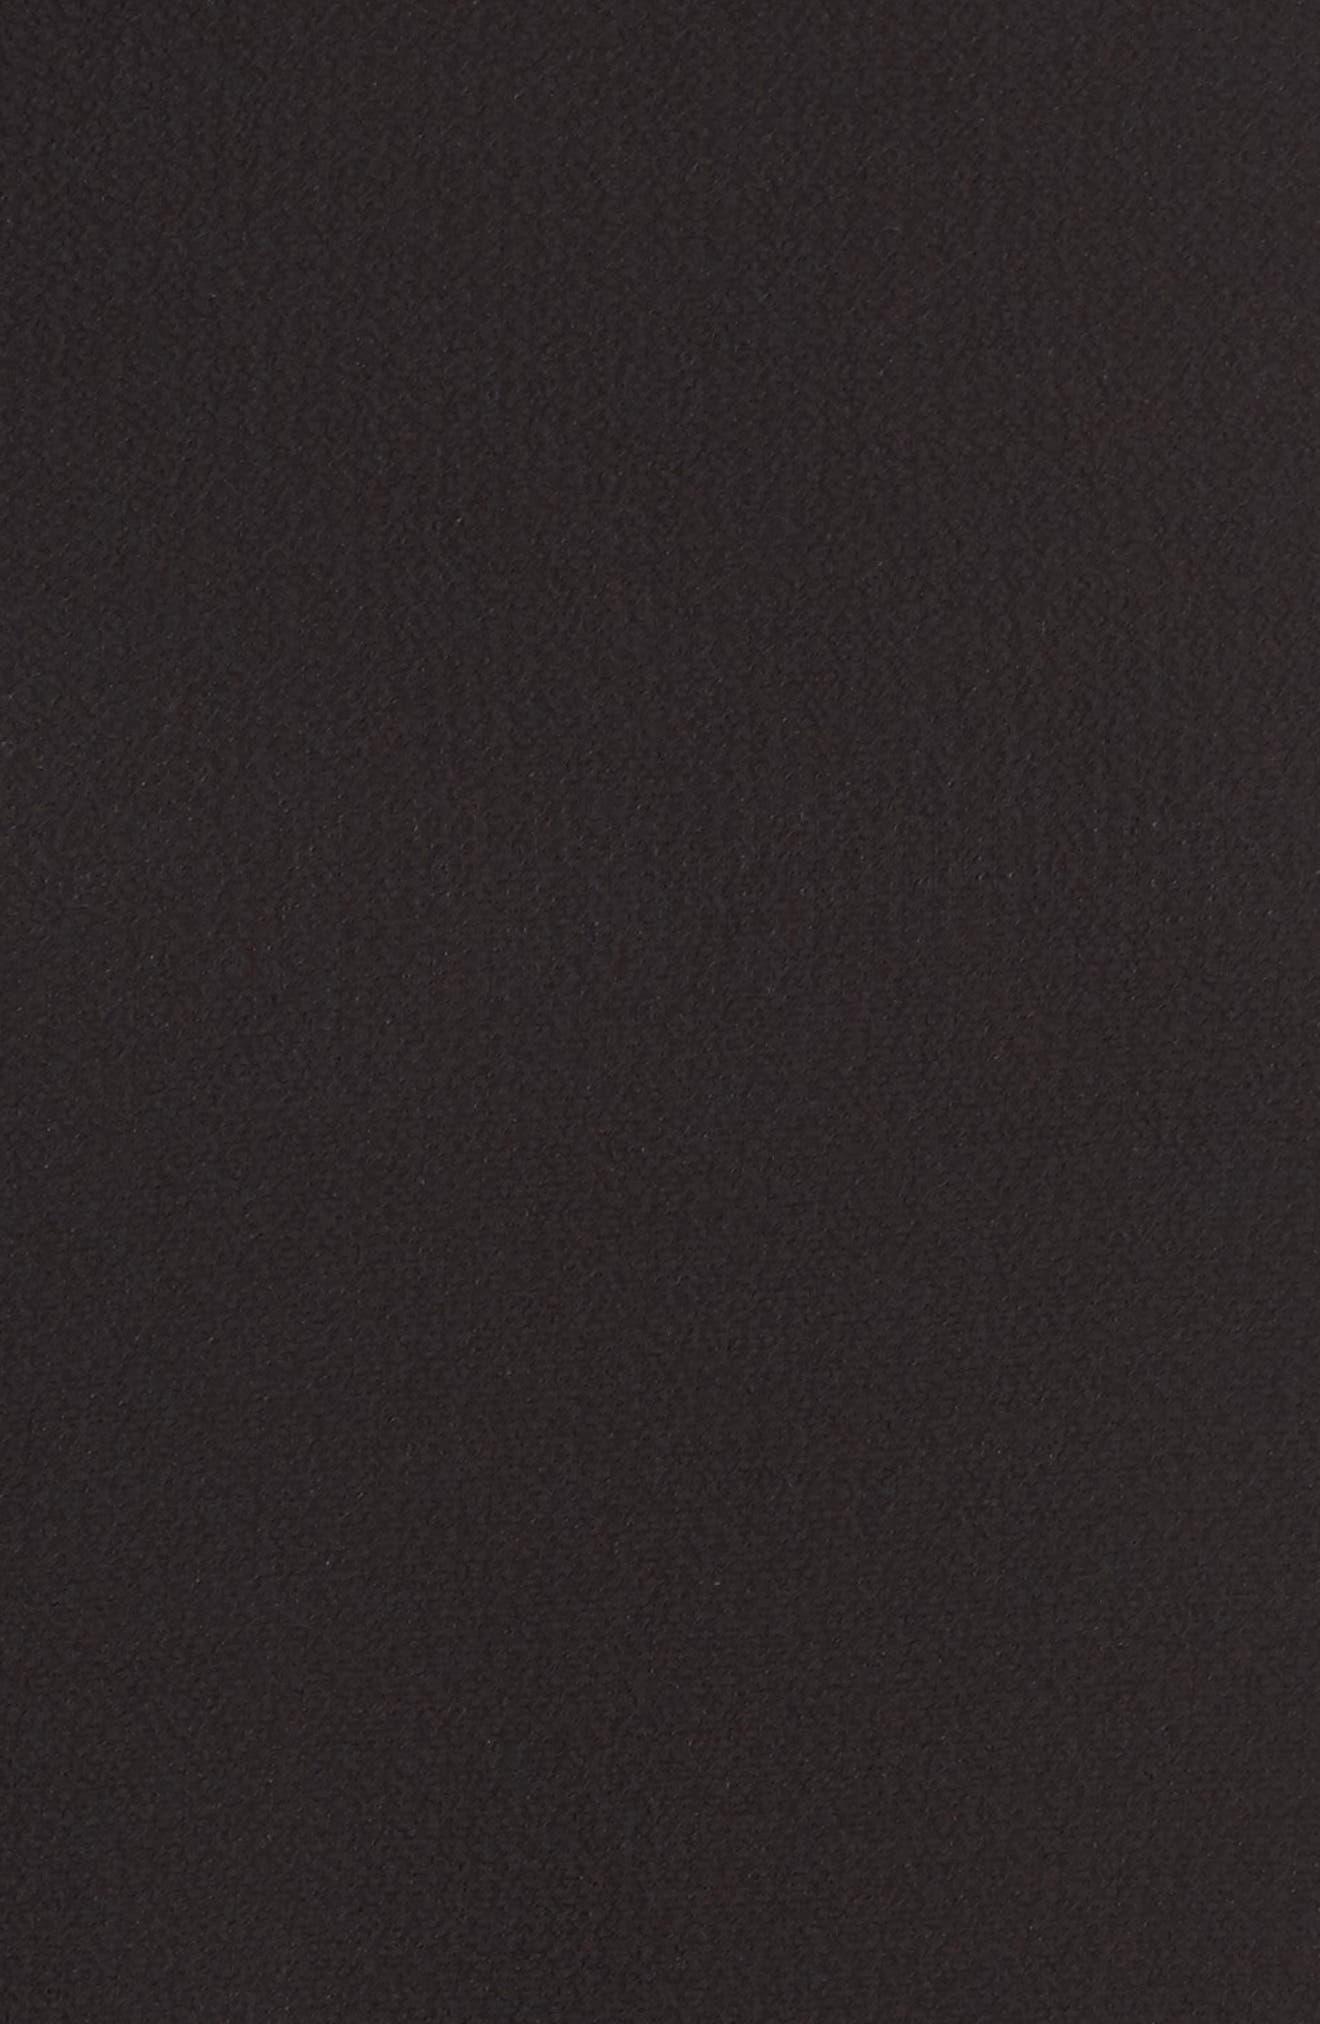 Ruffle Asymmetrical Blouse,                             Alternate thumbnail 5, color,                             001